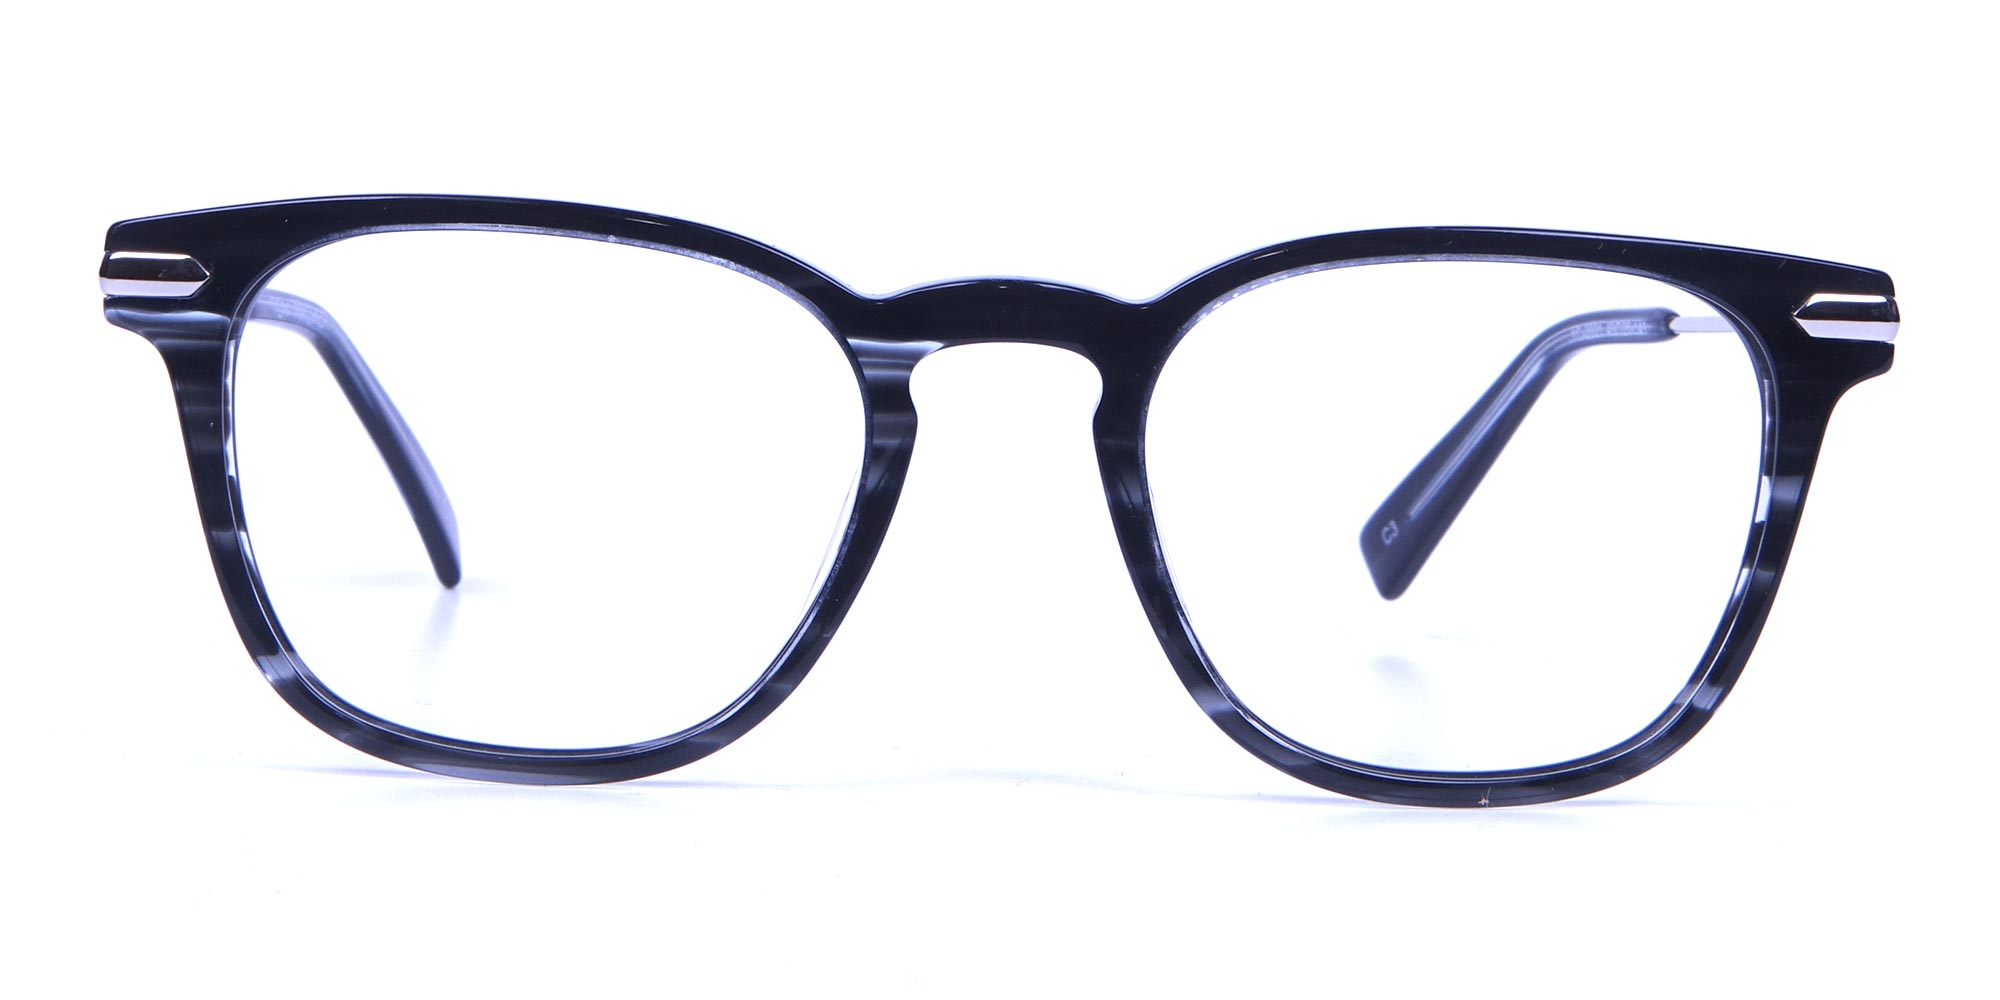 Black and White Striped Glasses